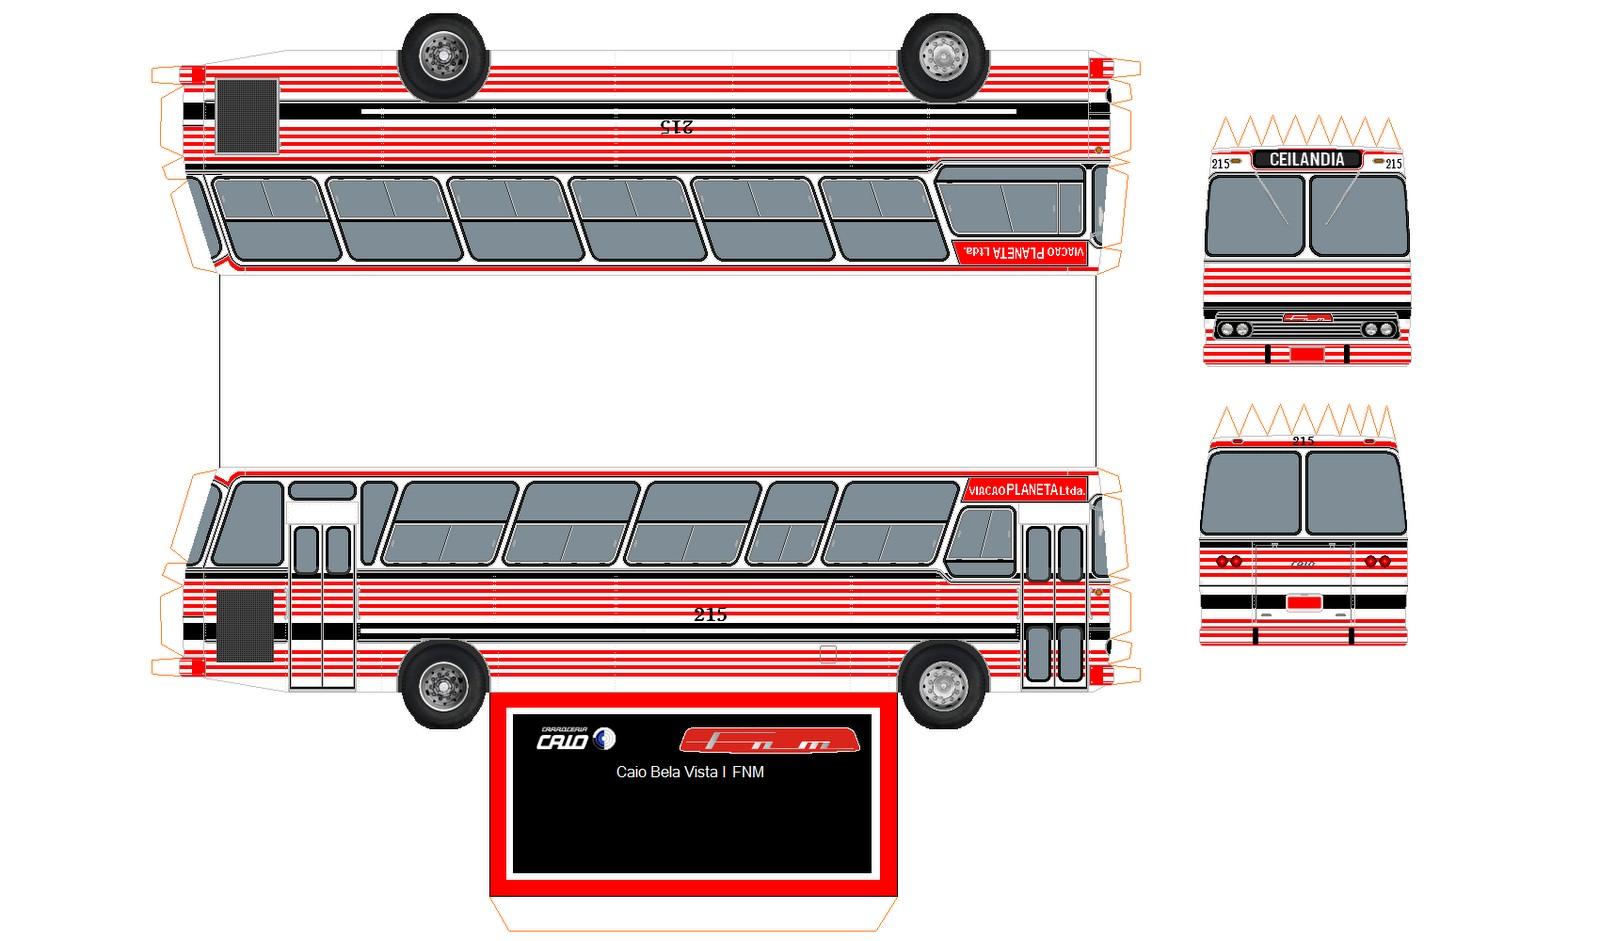 Fire Truck Papercraft Caio Bela Vista Fnm Misha Pinterest